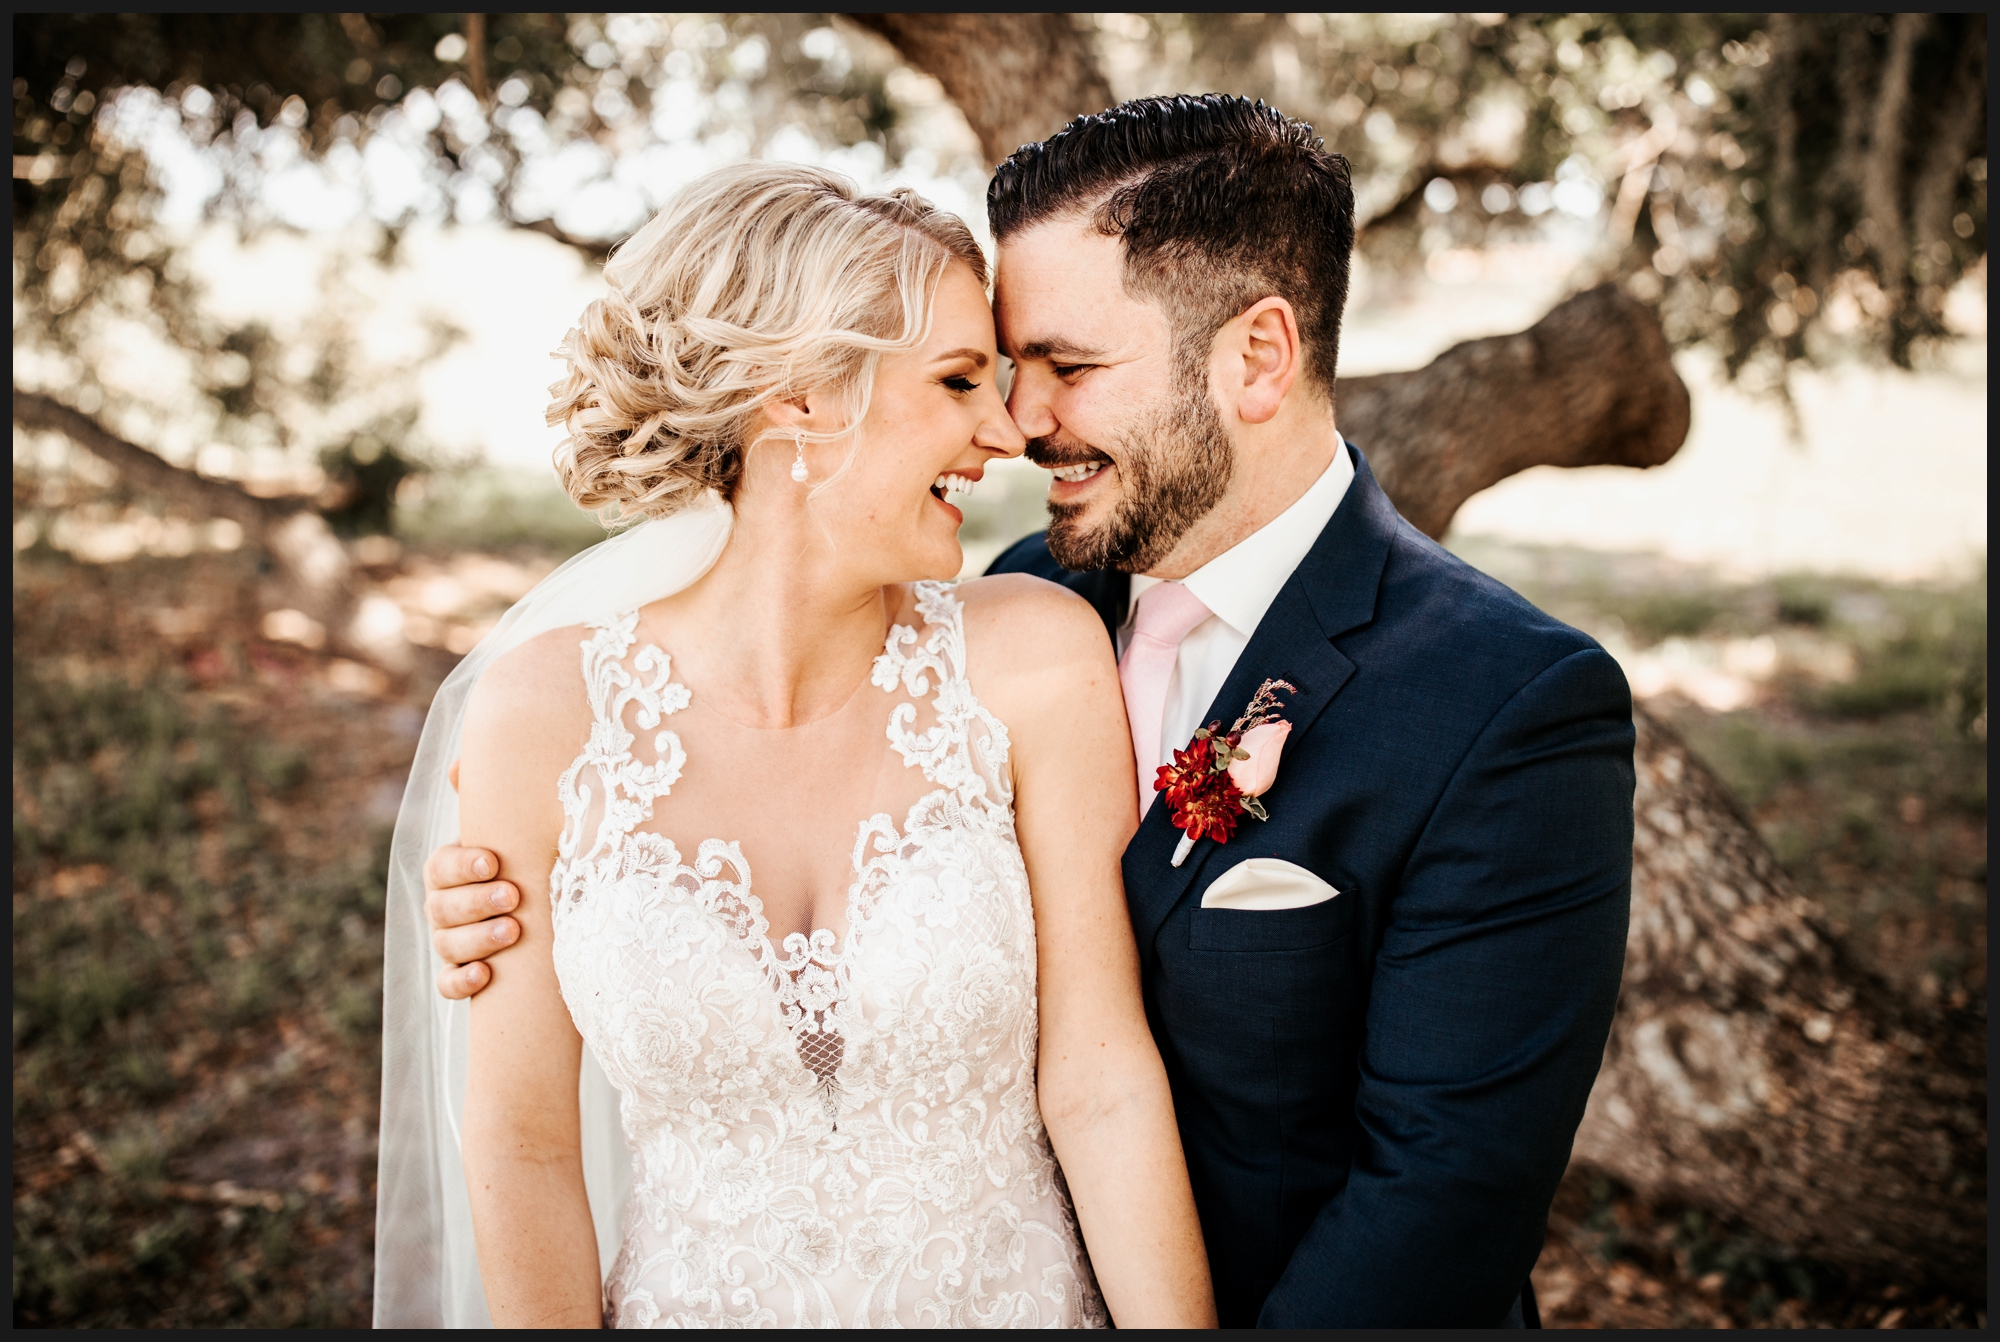 Orlando-Wedding-Photographer-destination-wedding-photographer-florida-wedding-photographer-hawaii-wedding-photographer_0579.jpg